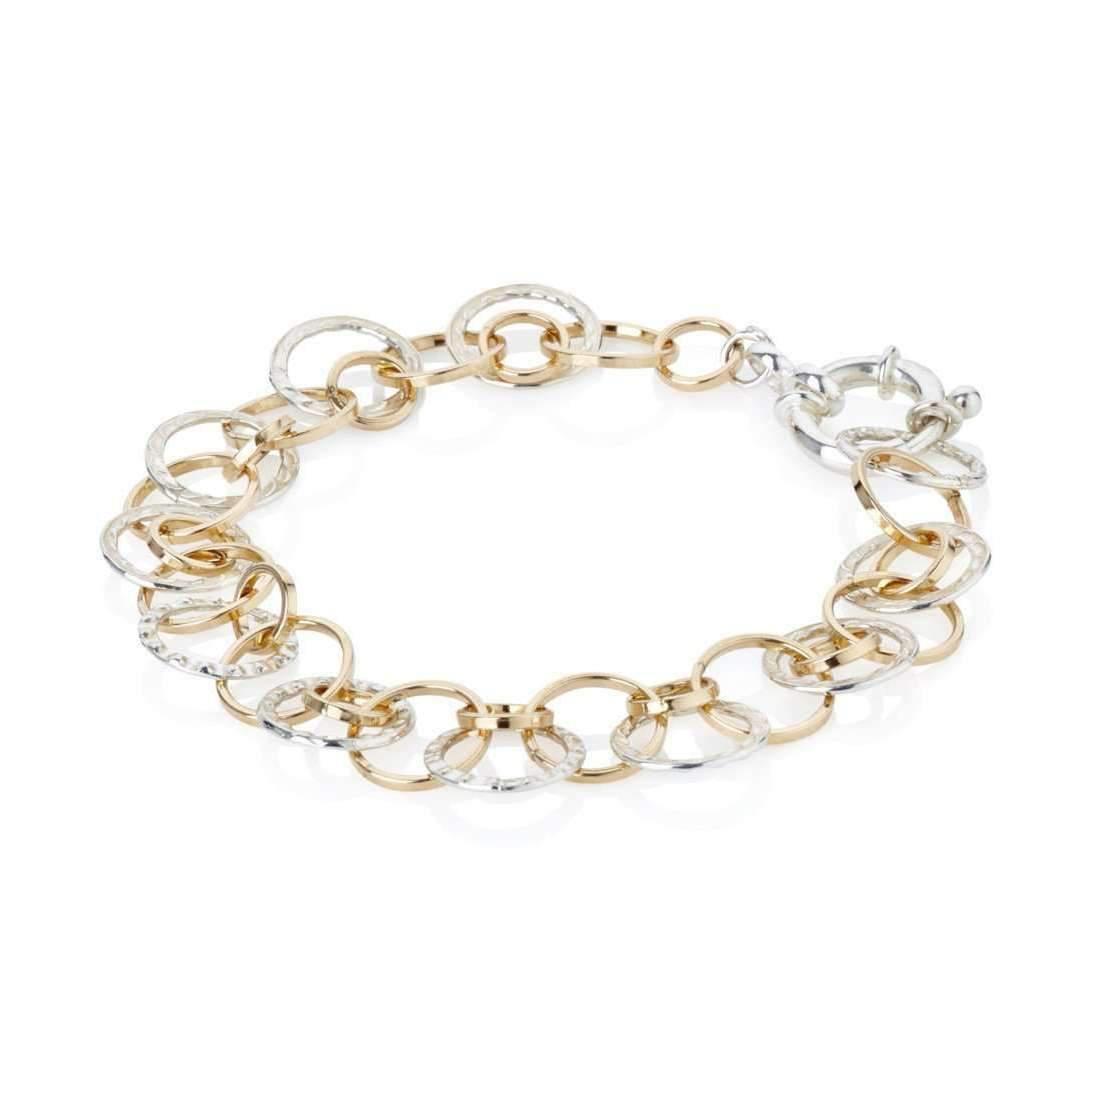 Lavan Individual Mix Design Silver & Gold Bracelet - Medium (7-7.25) TilNGXq